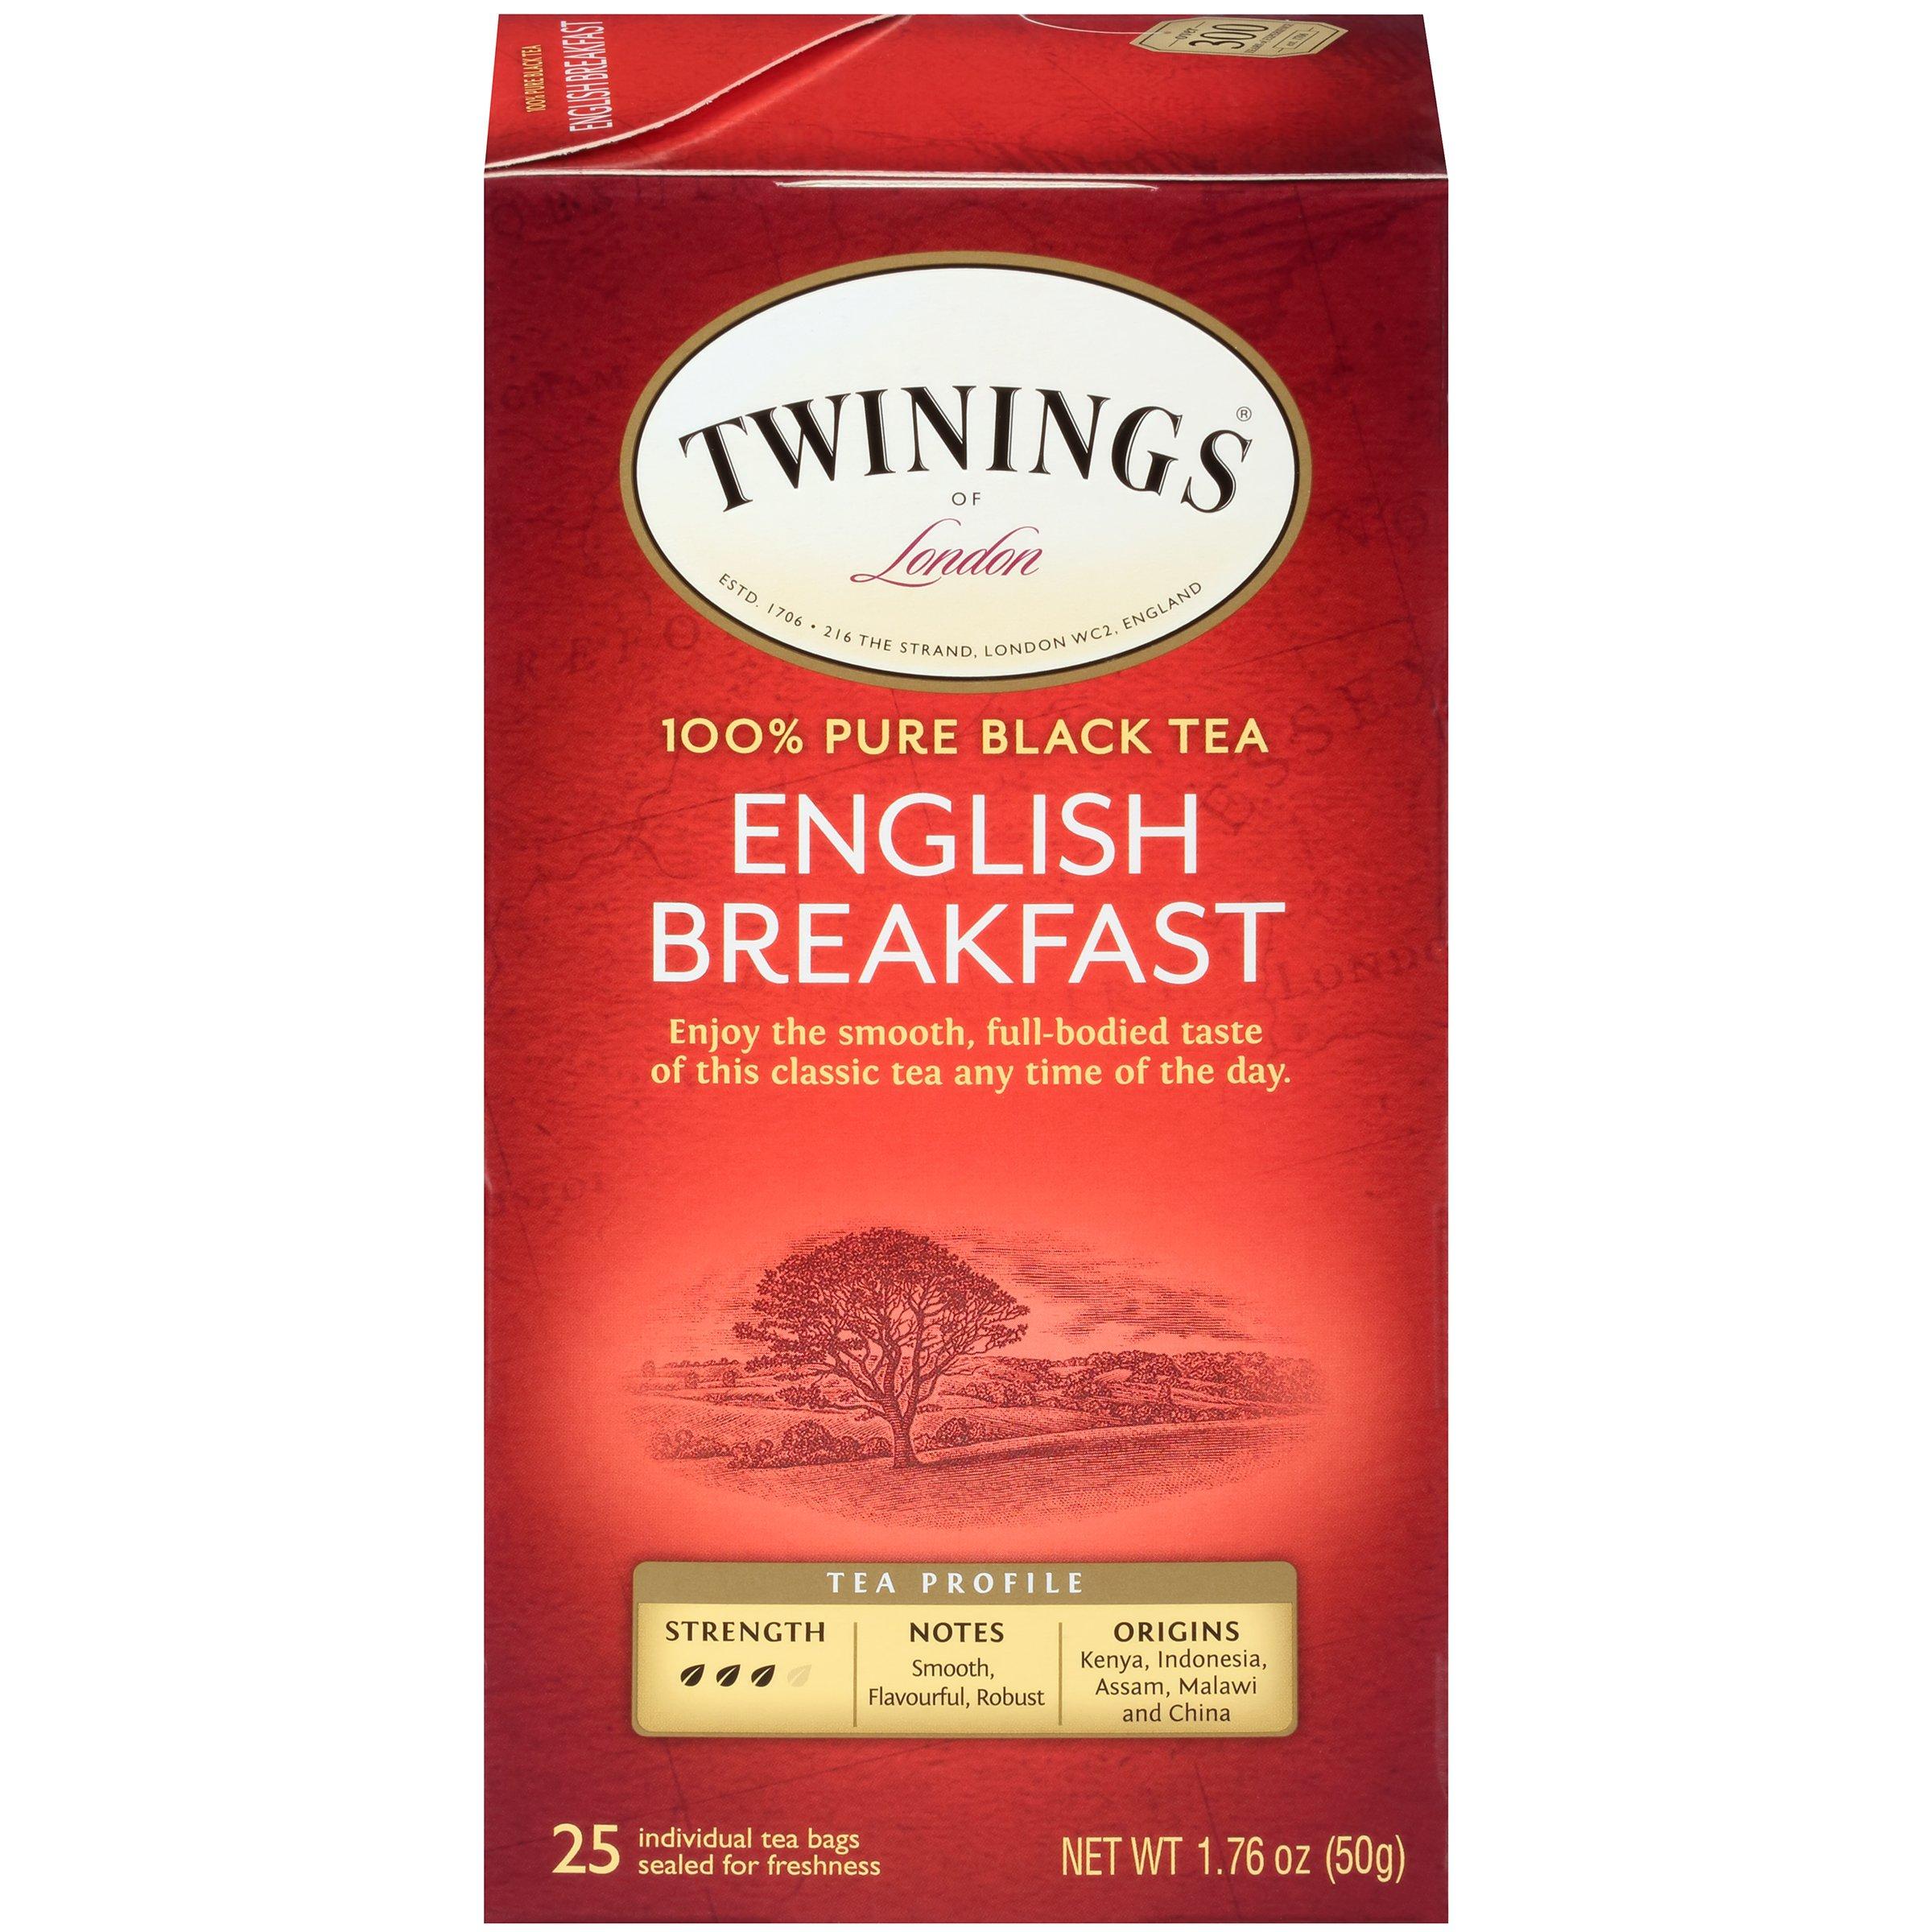 Twinings of London English Breakfast Black Tea Bags, 25 Count (Pack of 6)